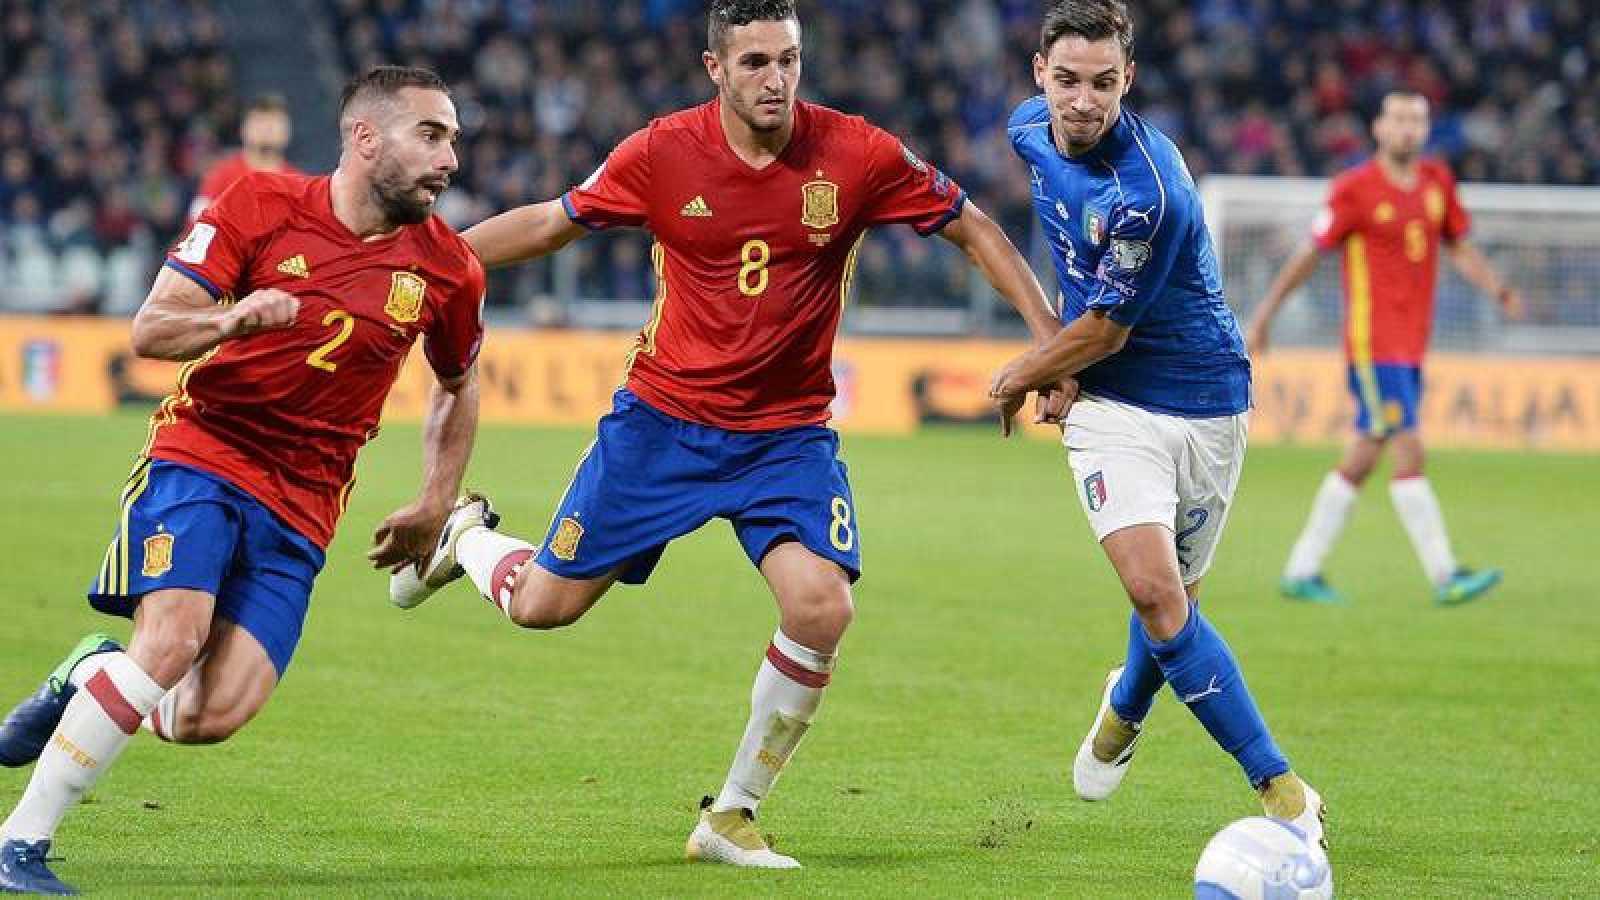 España e Italia disputan una 'final' en el Bernabéu